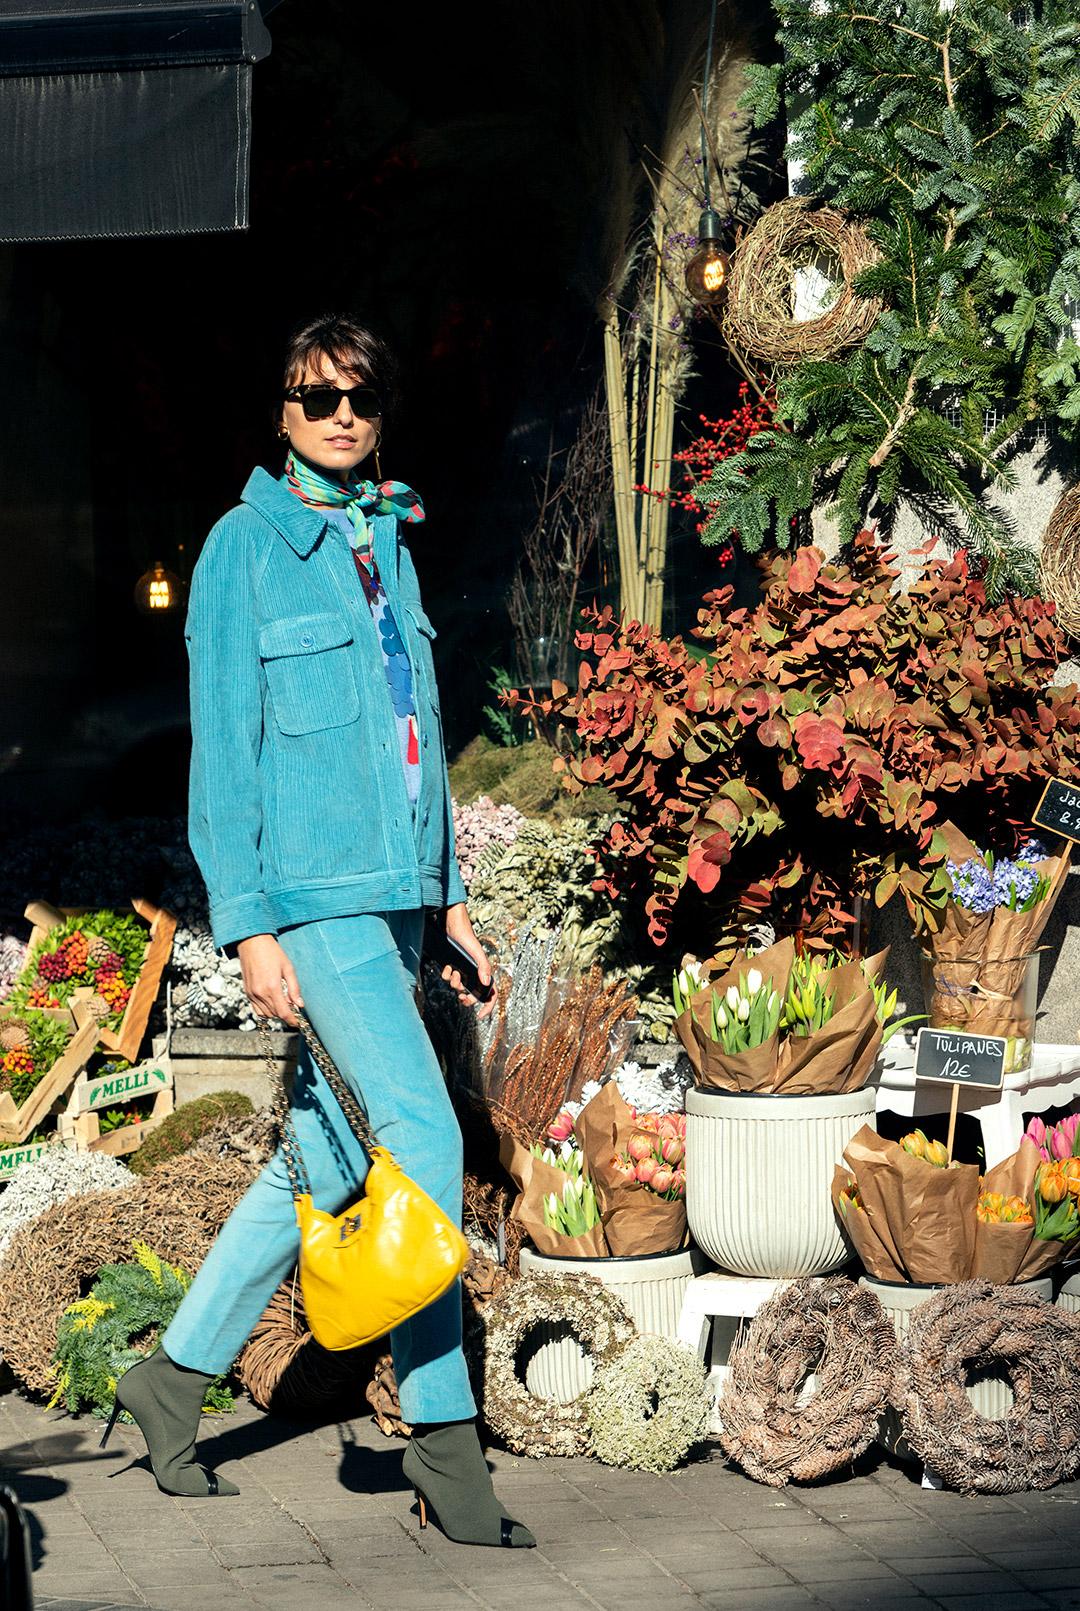 azul-streetstyle-mayte-de-la-iglesia-1080px-03